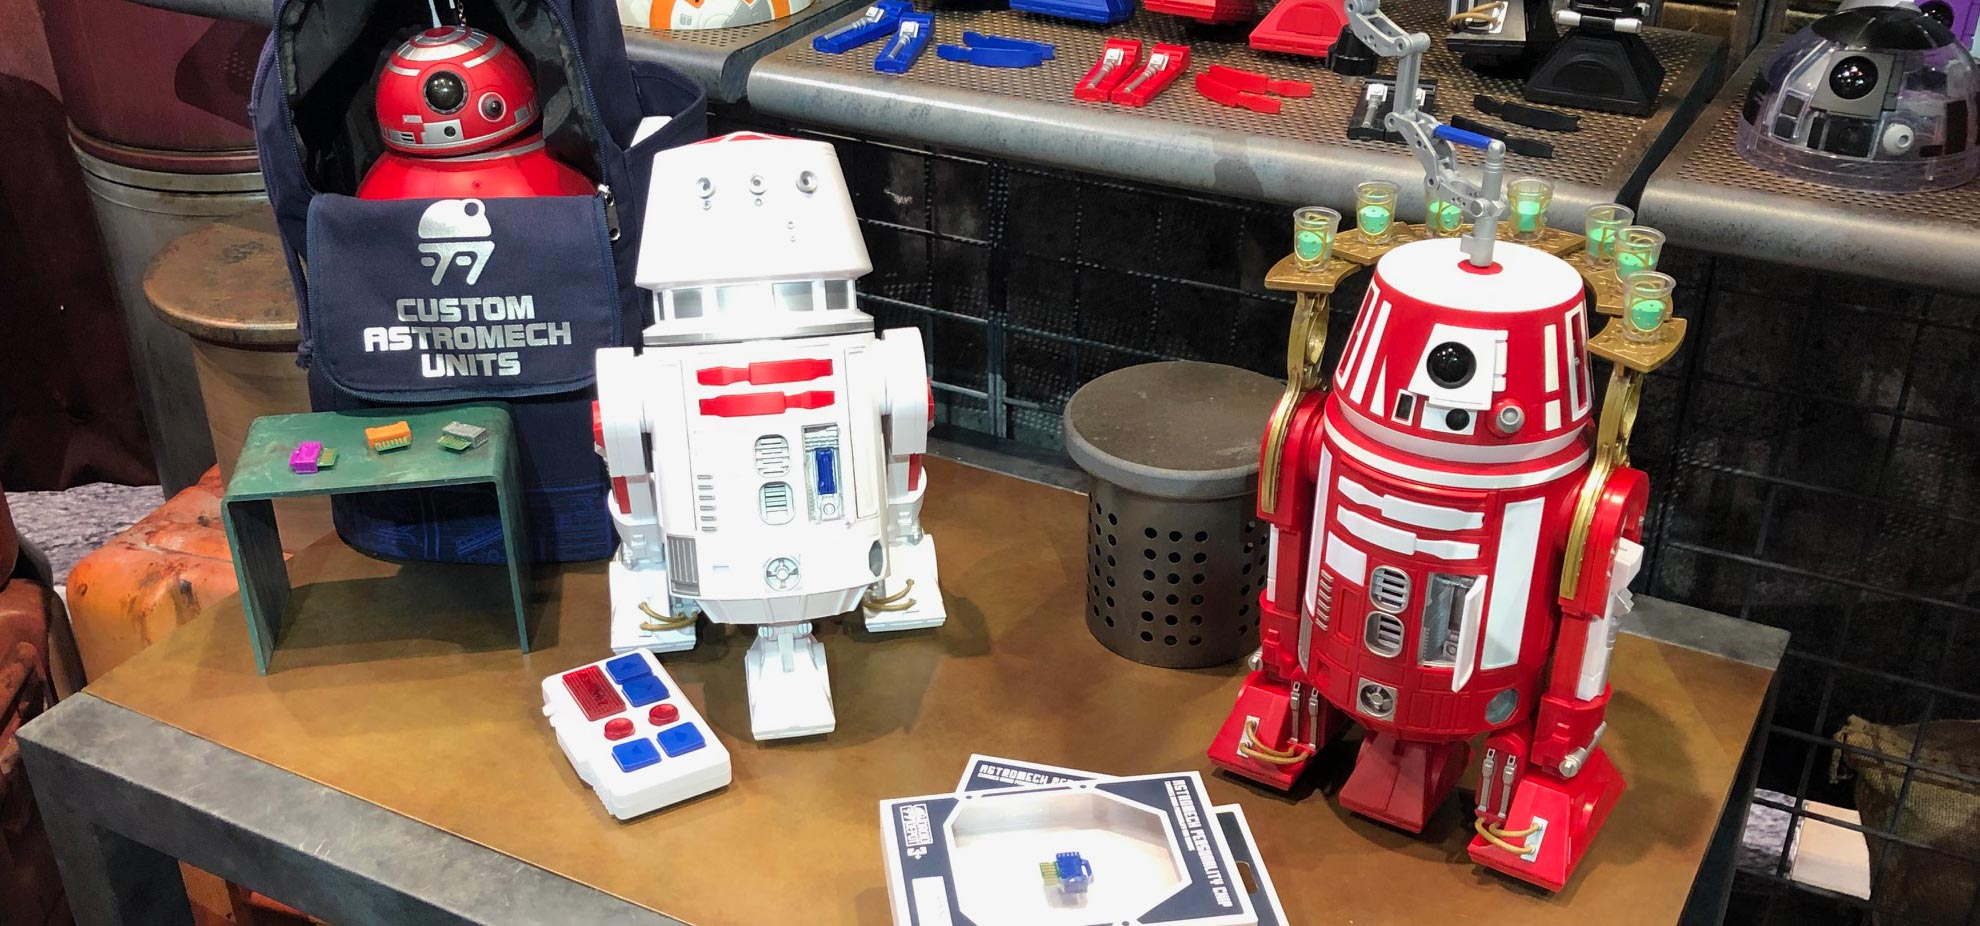 Star Wars Galaxys edge droids